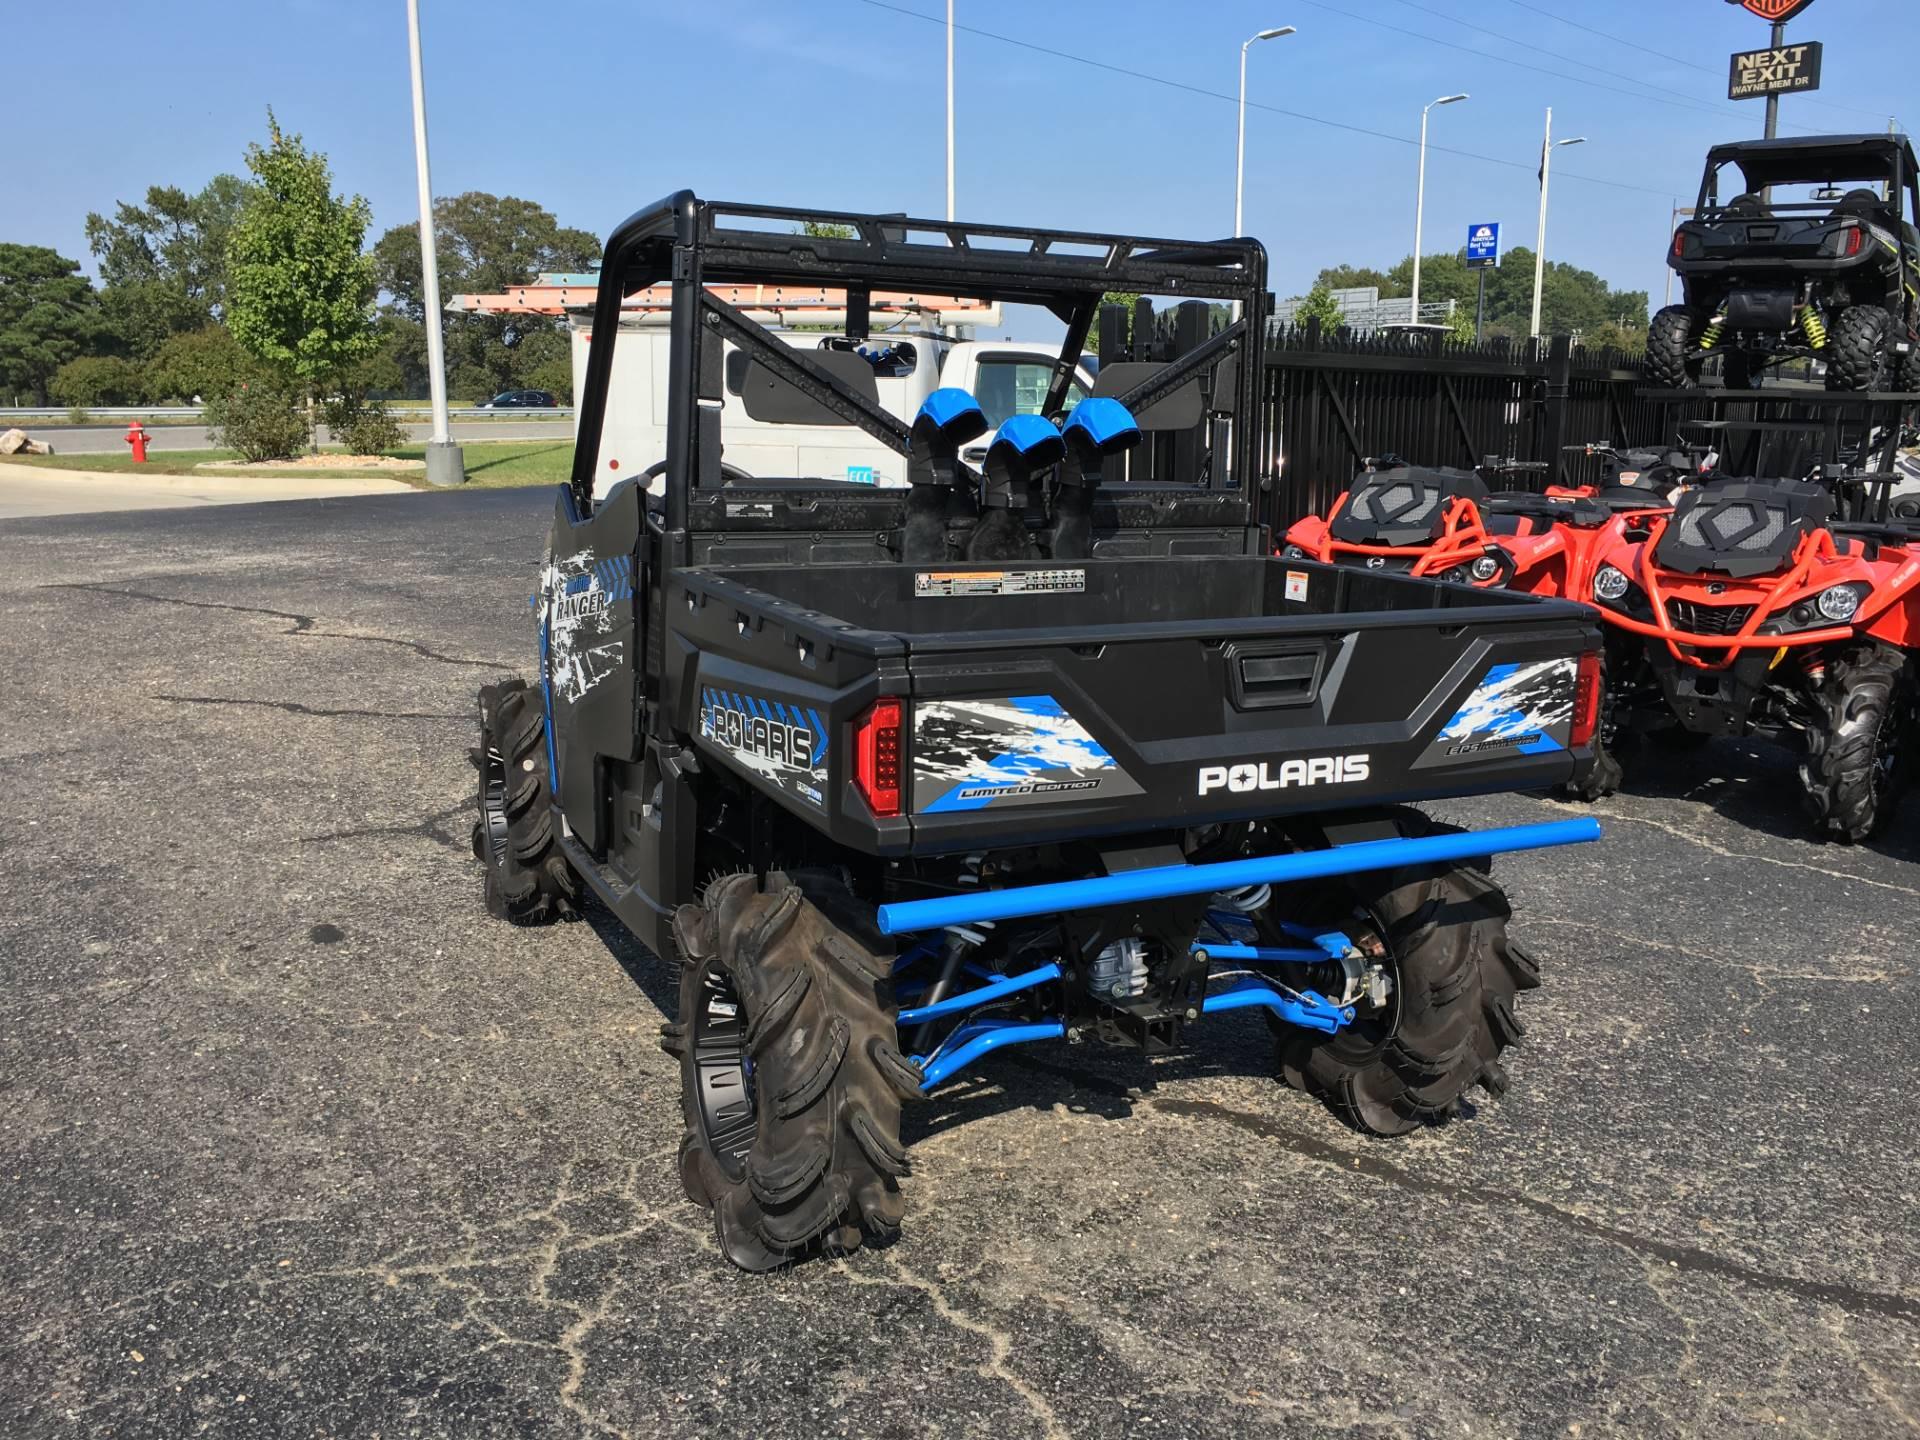 2017 polaris ranger xp 1000 eps high lifter edition in goldsboro north carolina